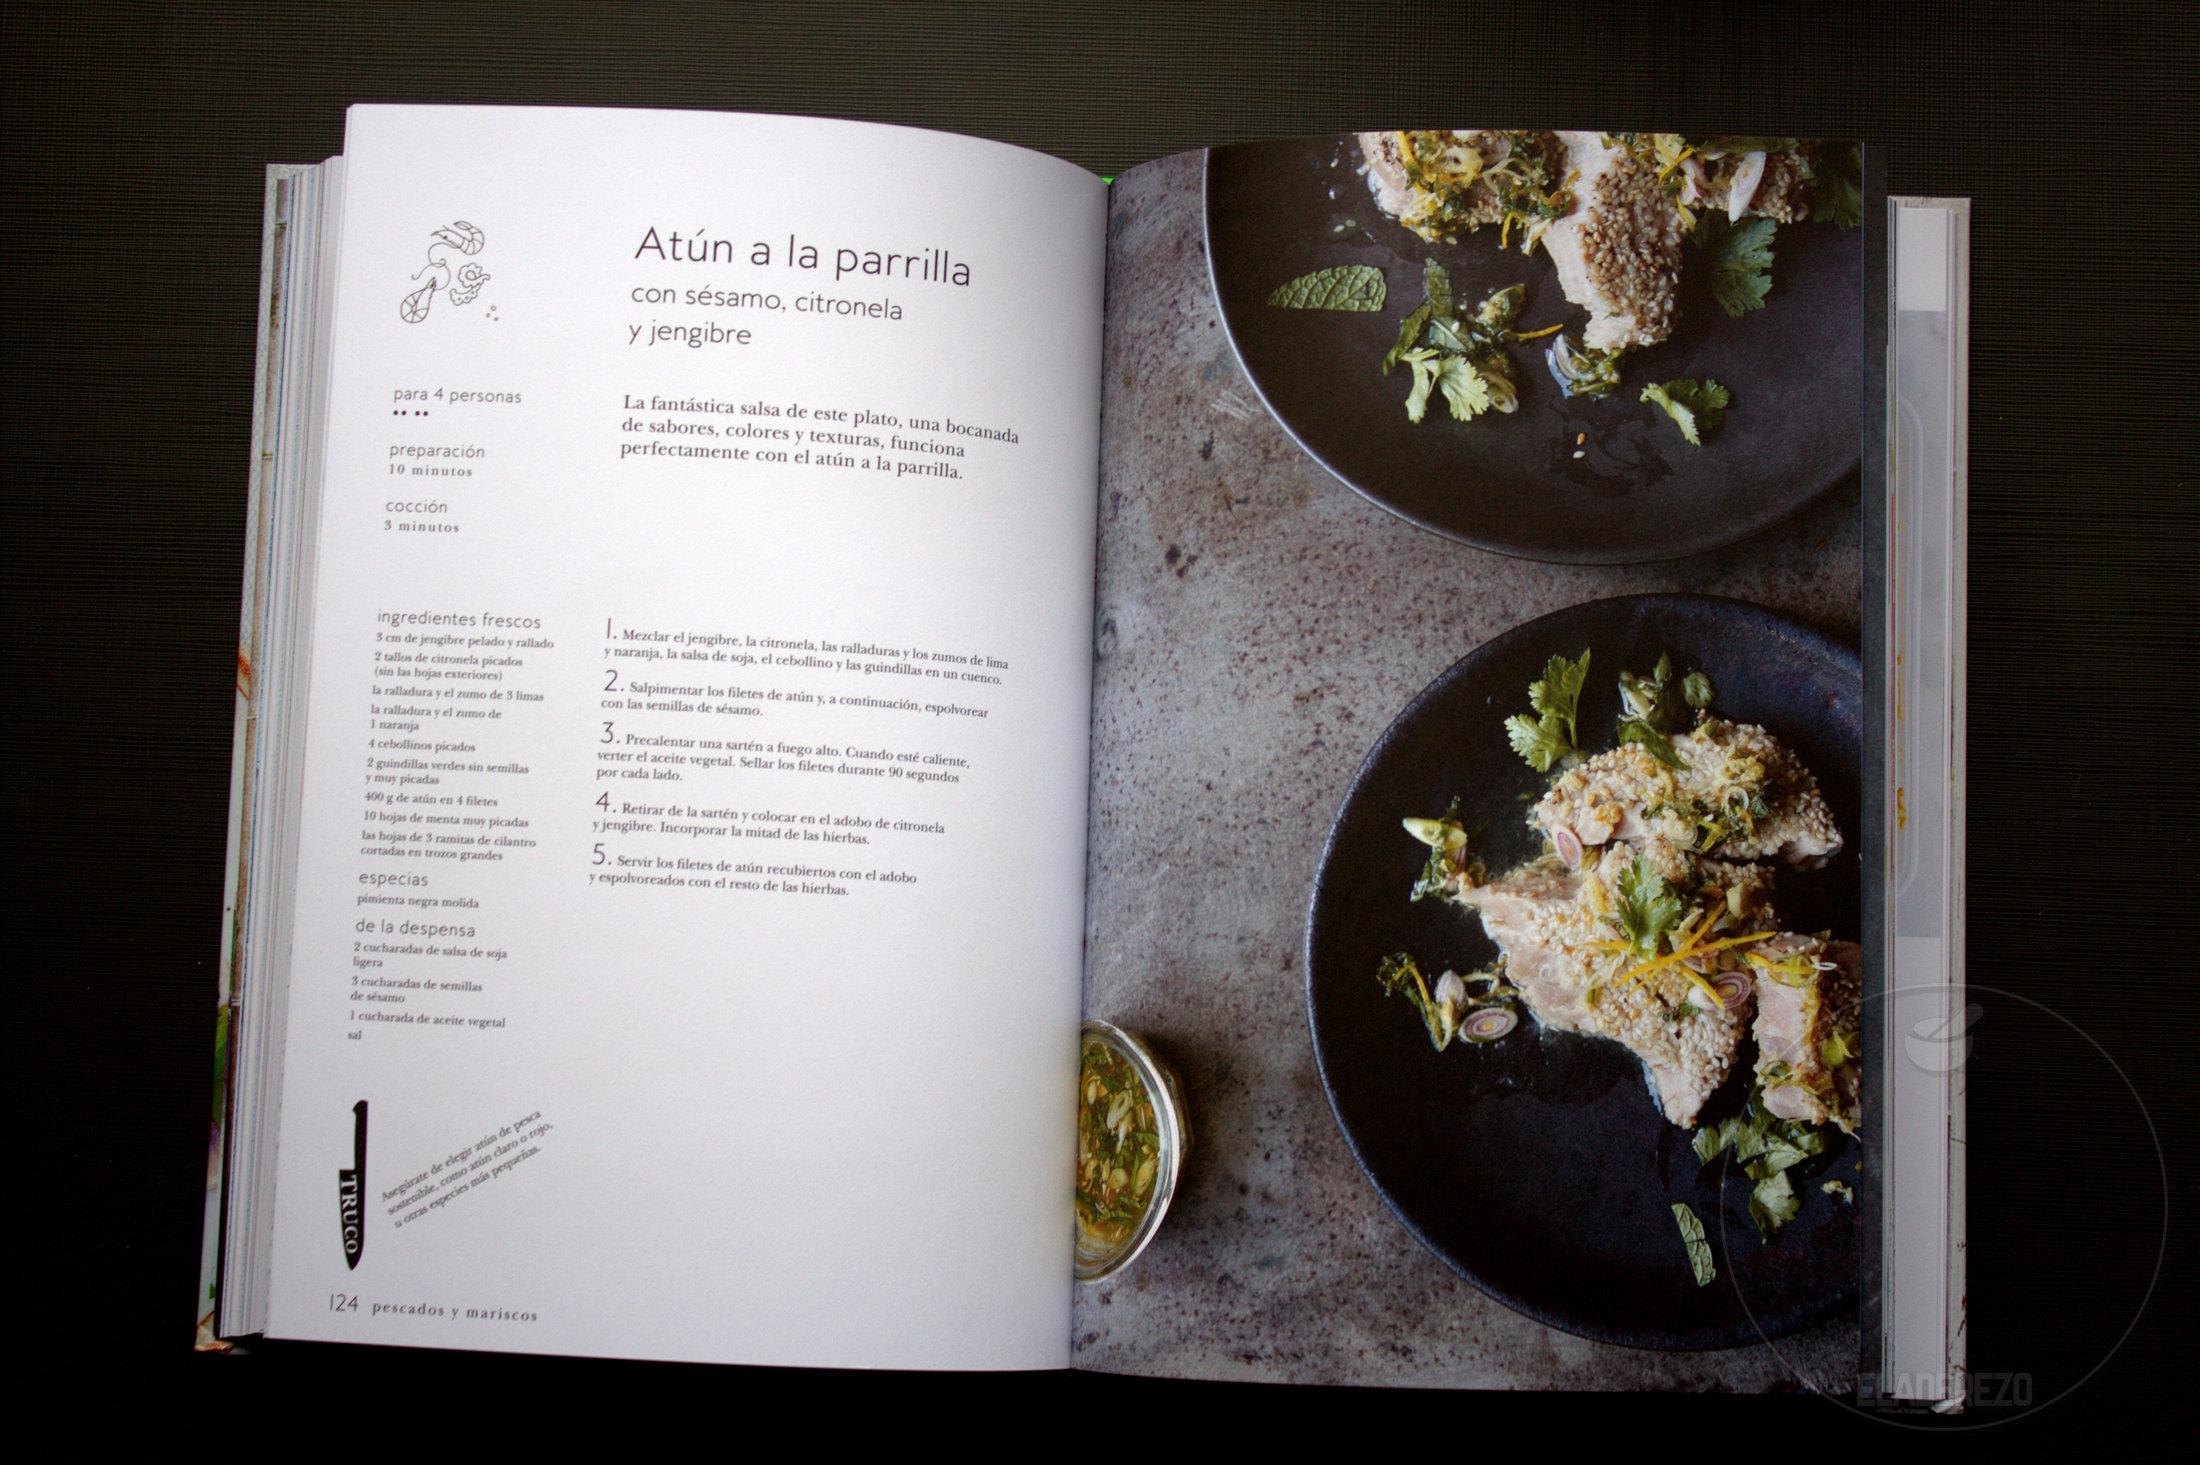 atun a la parrilla - Mi primer libro de cocina thai